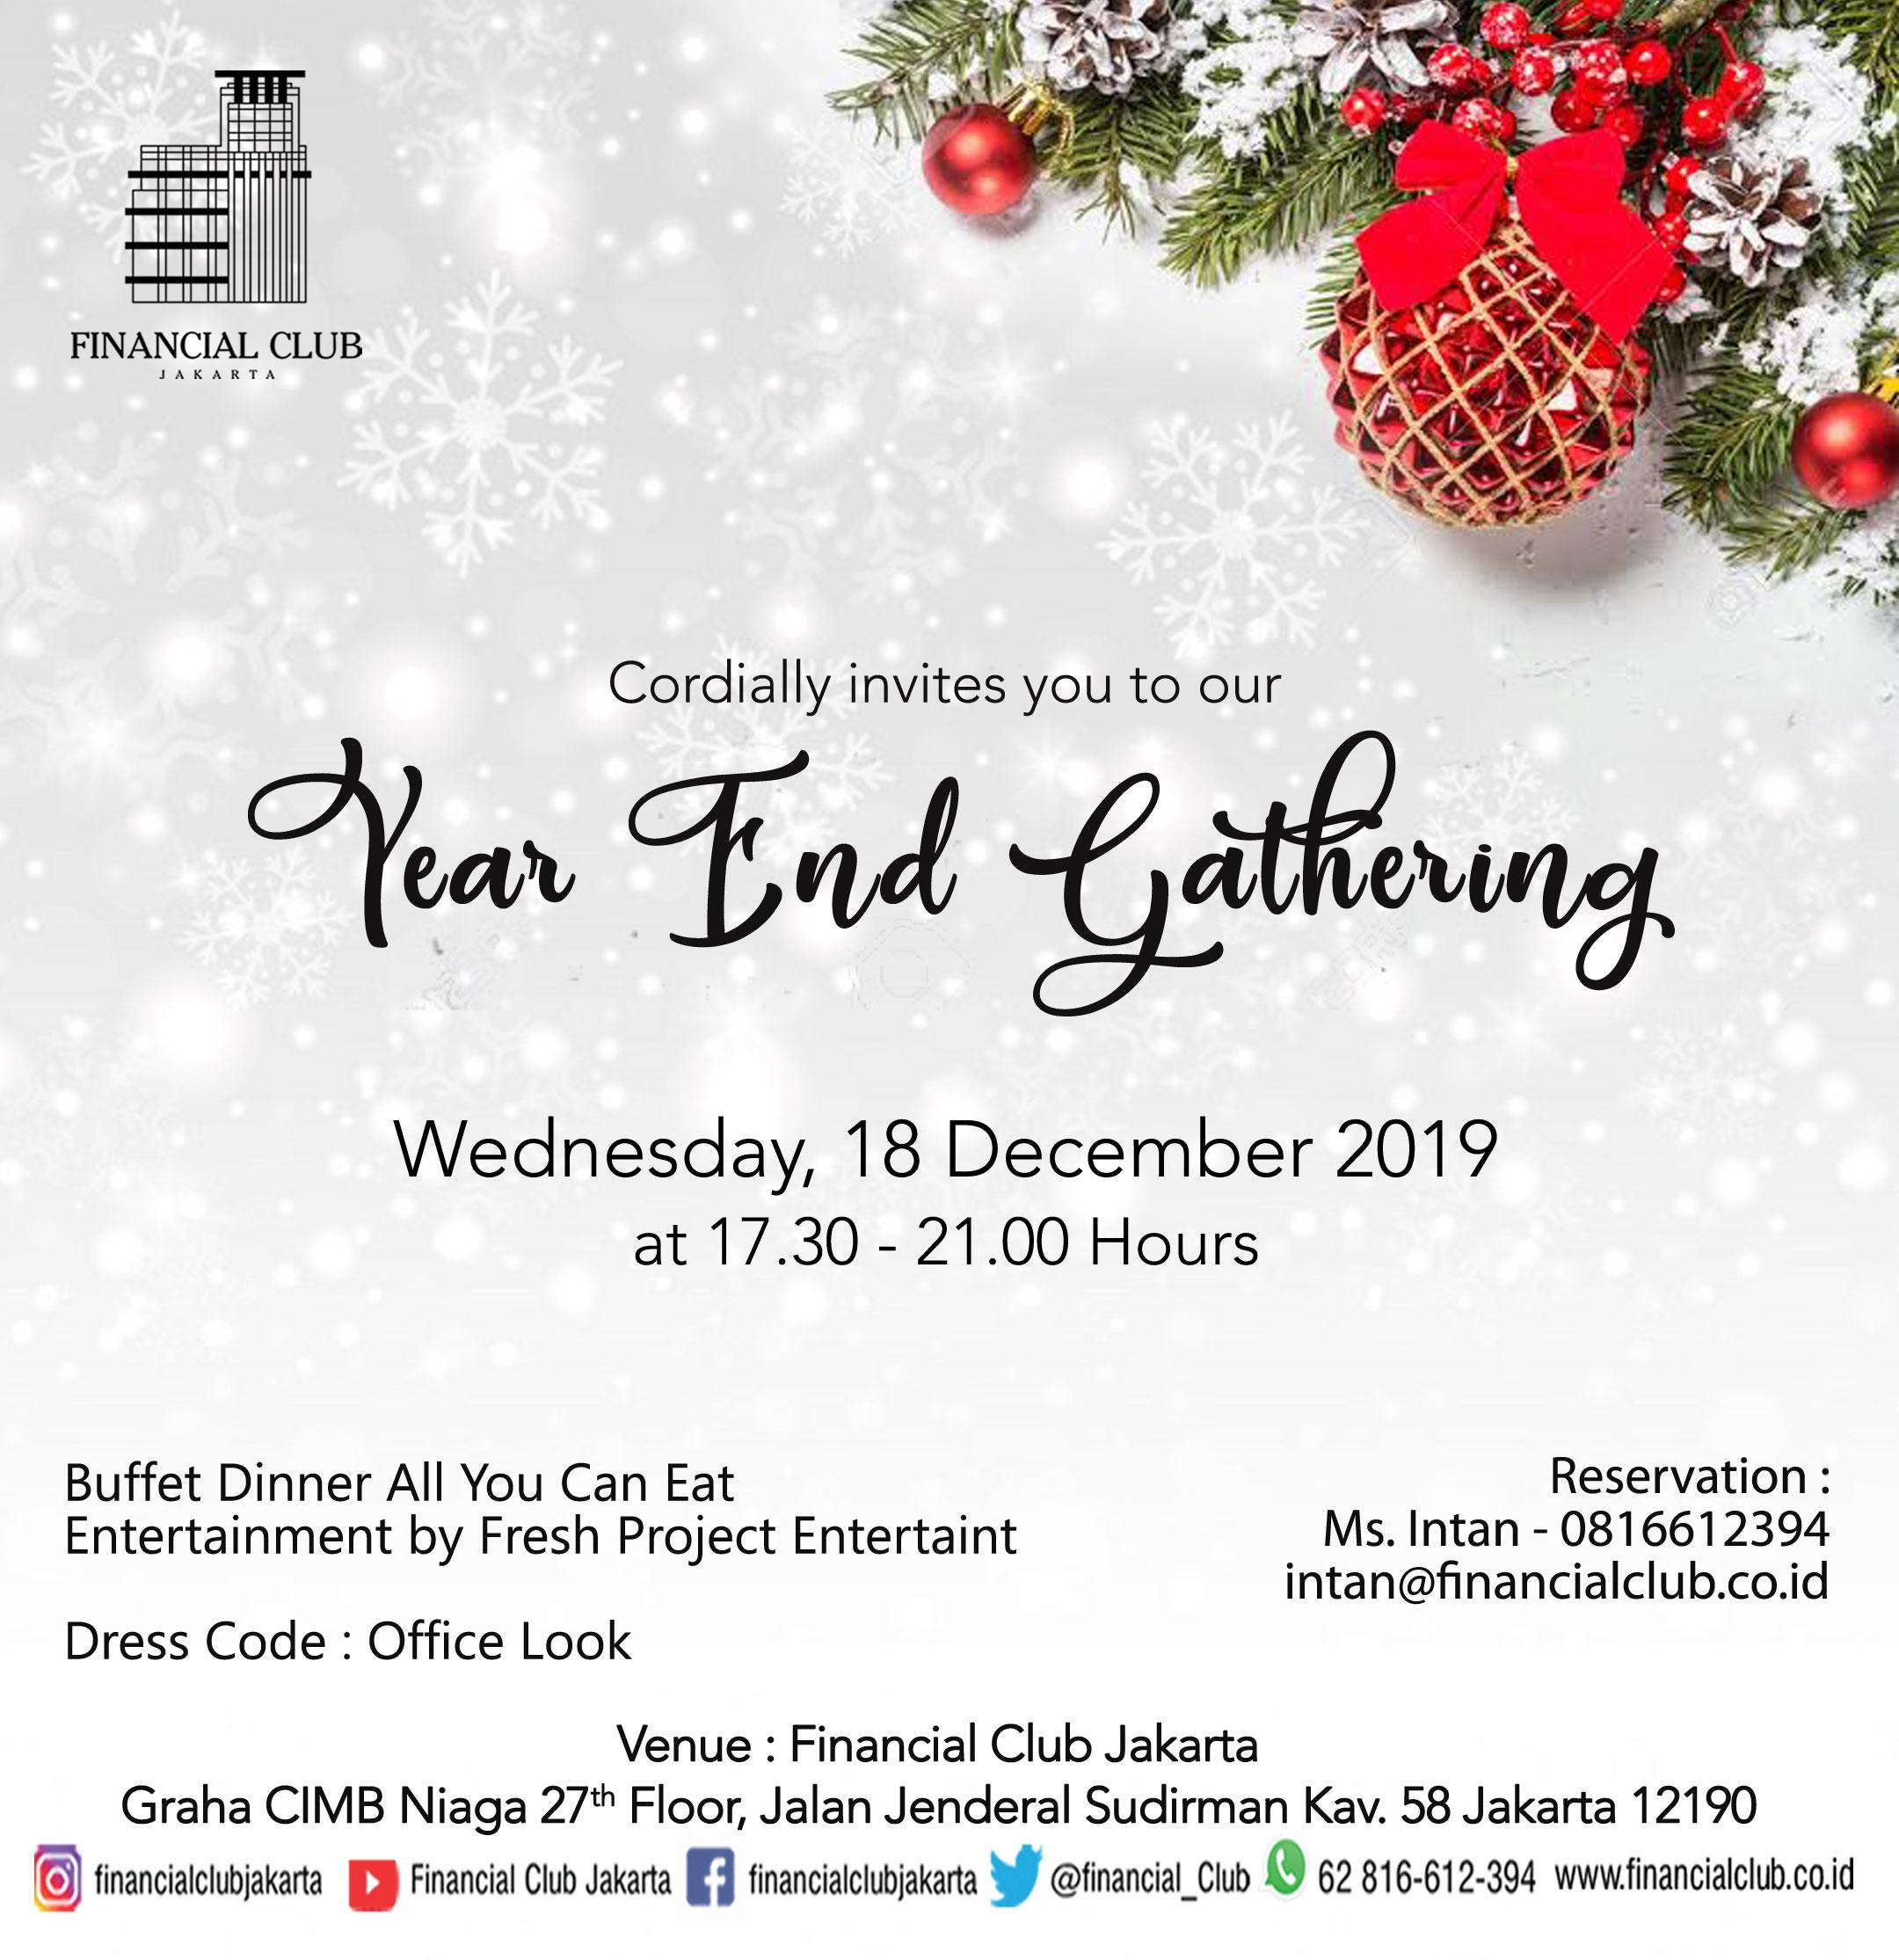 Year End Gathering 2019 at Financial Club Jakarta